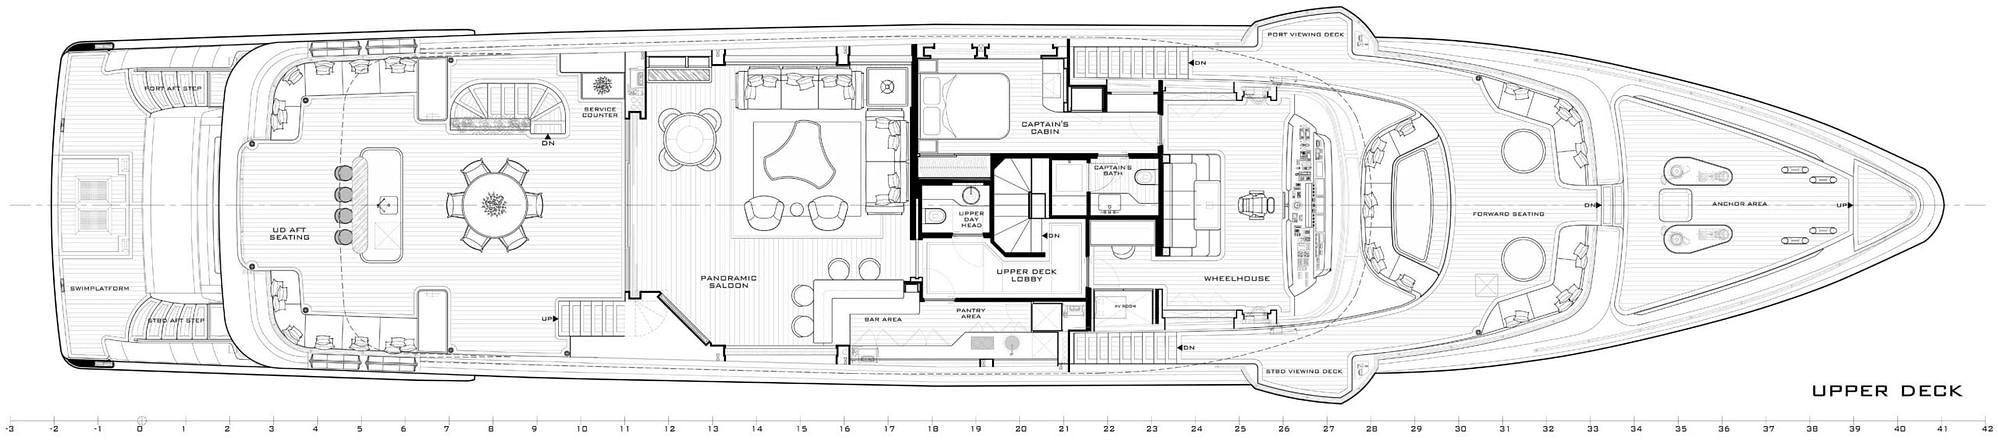 gulf craft majesty 140 layout upper deck